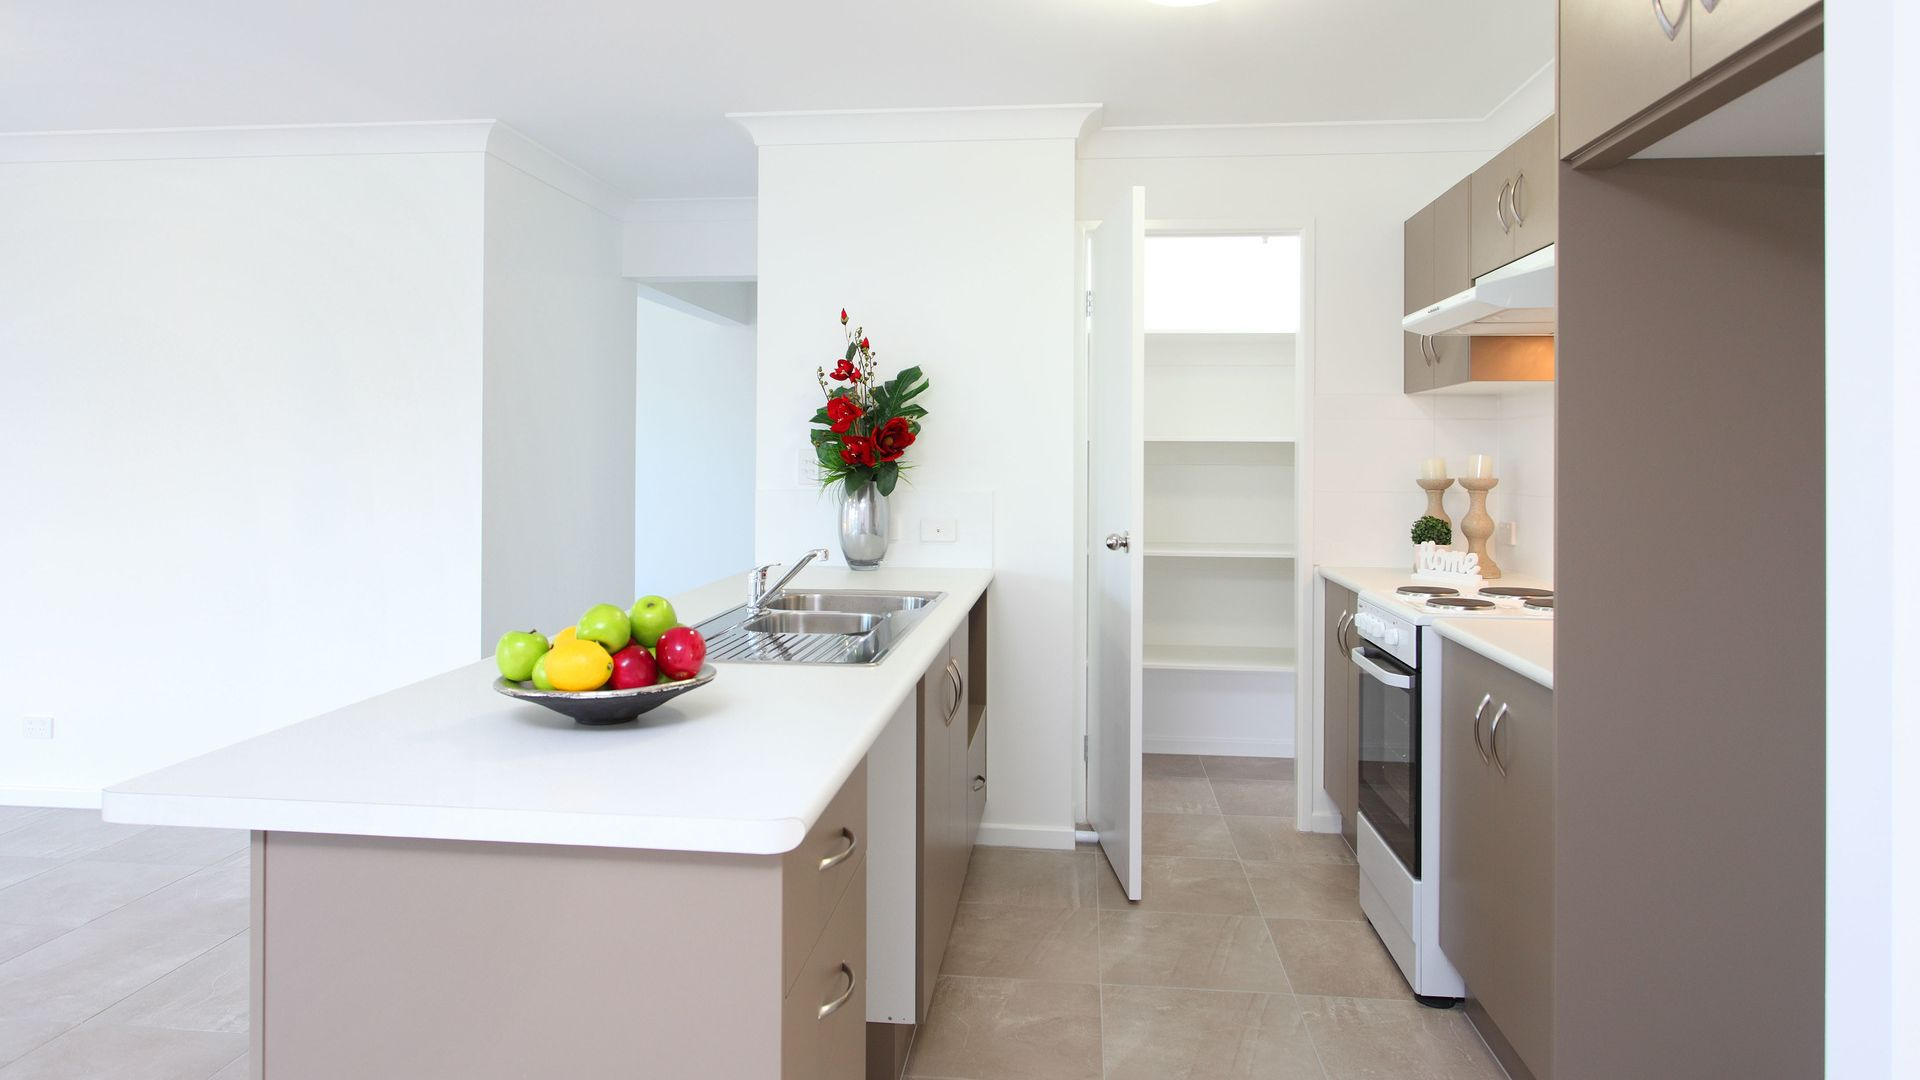 Lot 123 Essington Rise, Leichhardt QLD 4305, Image 1